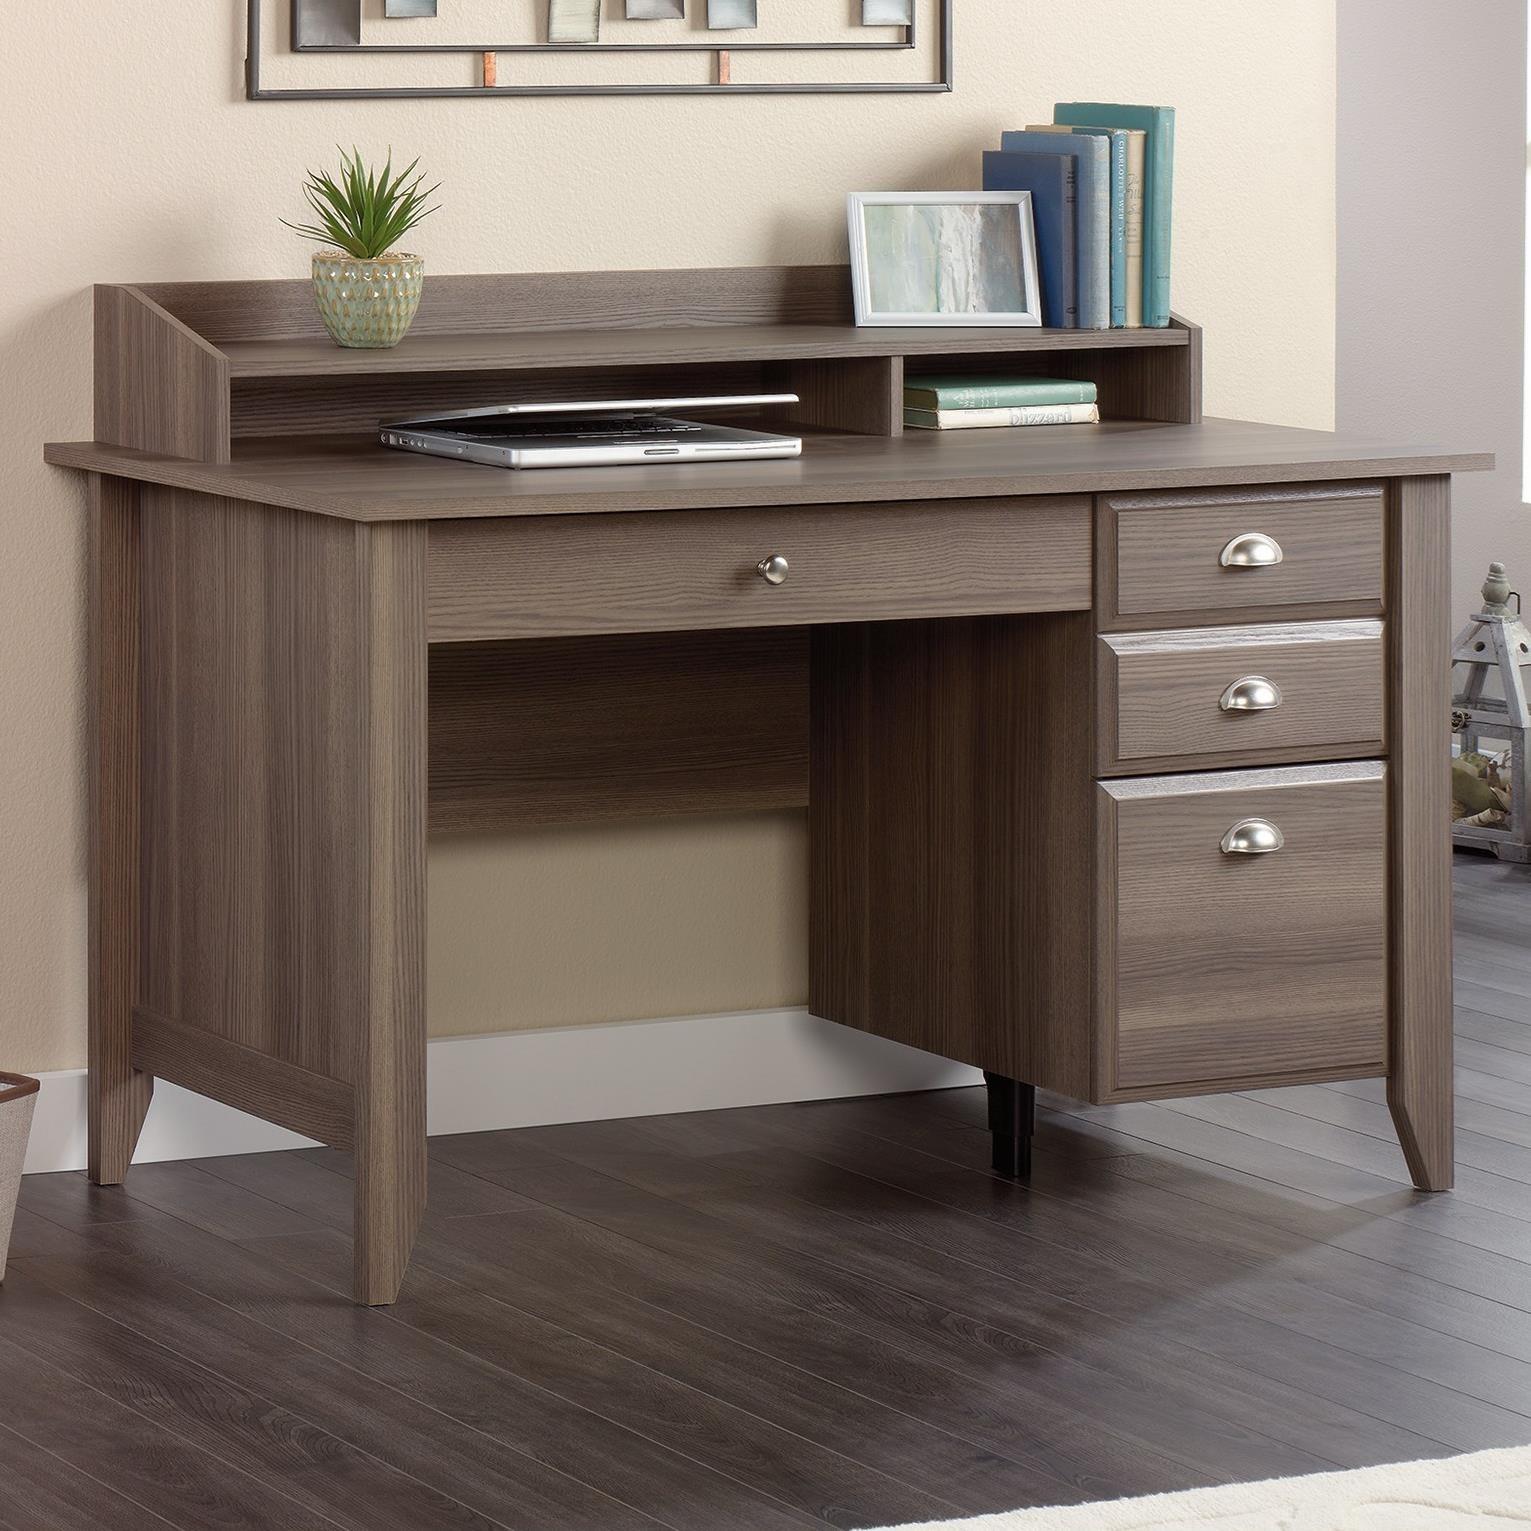 Sauder Shoal Creek 418657 Desk with Keyboard Drawer